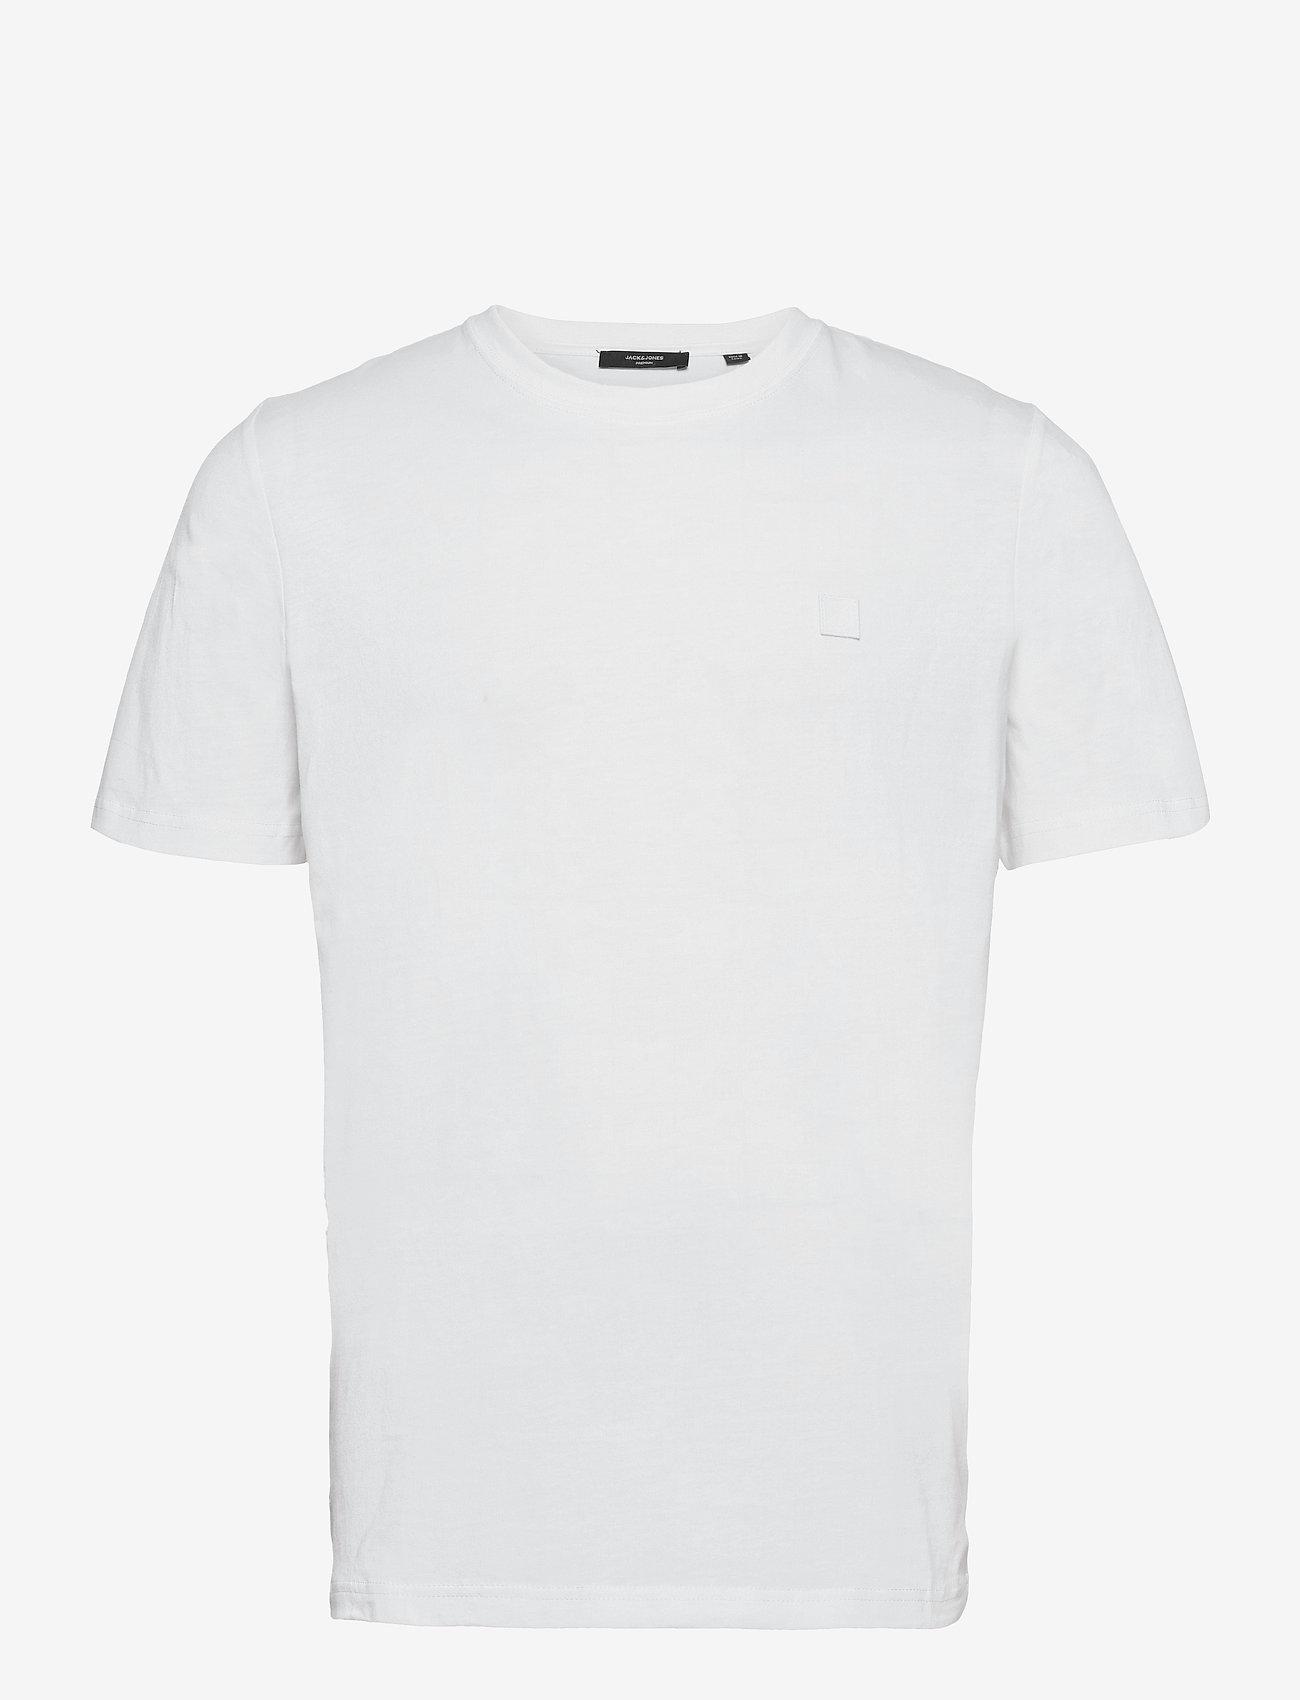 Jack & Jones - JPRBLASTUDIO SS TEE SOLID LTN - kortärmade t-shirts - white - 0